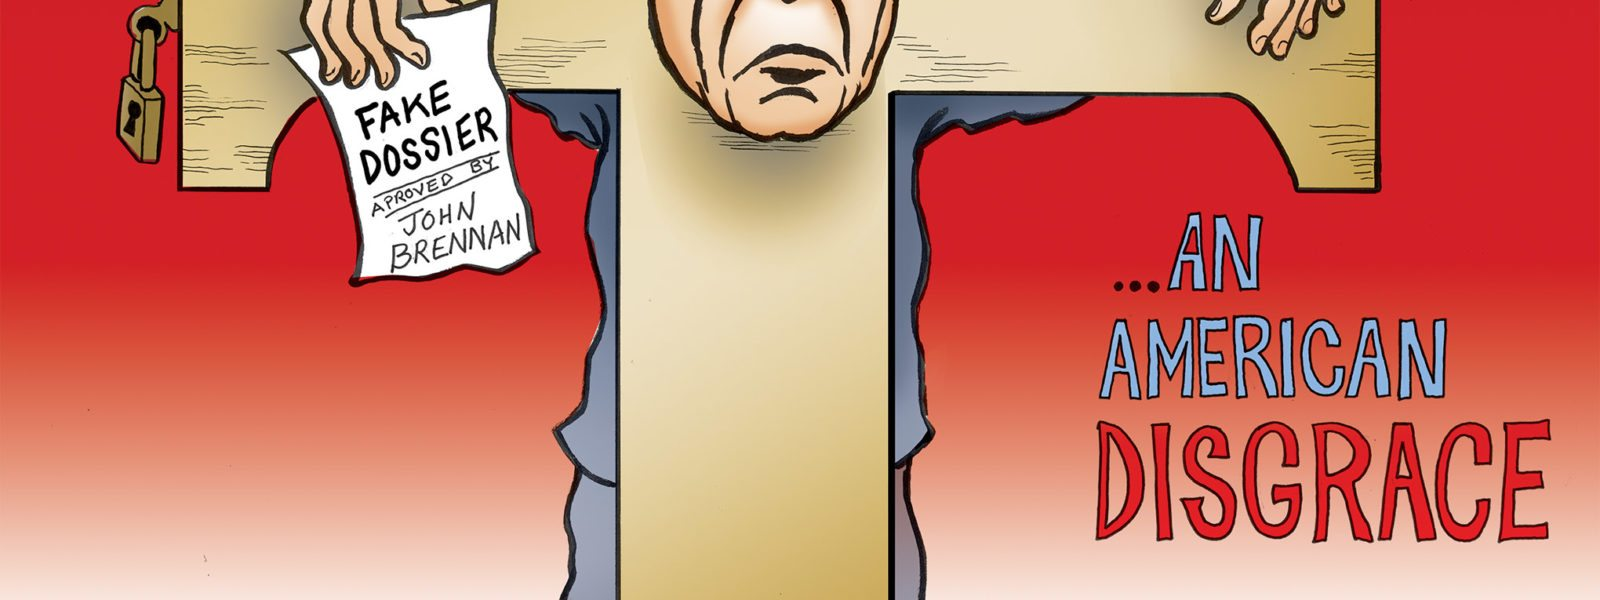 John Brennan American Disgrace